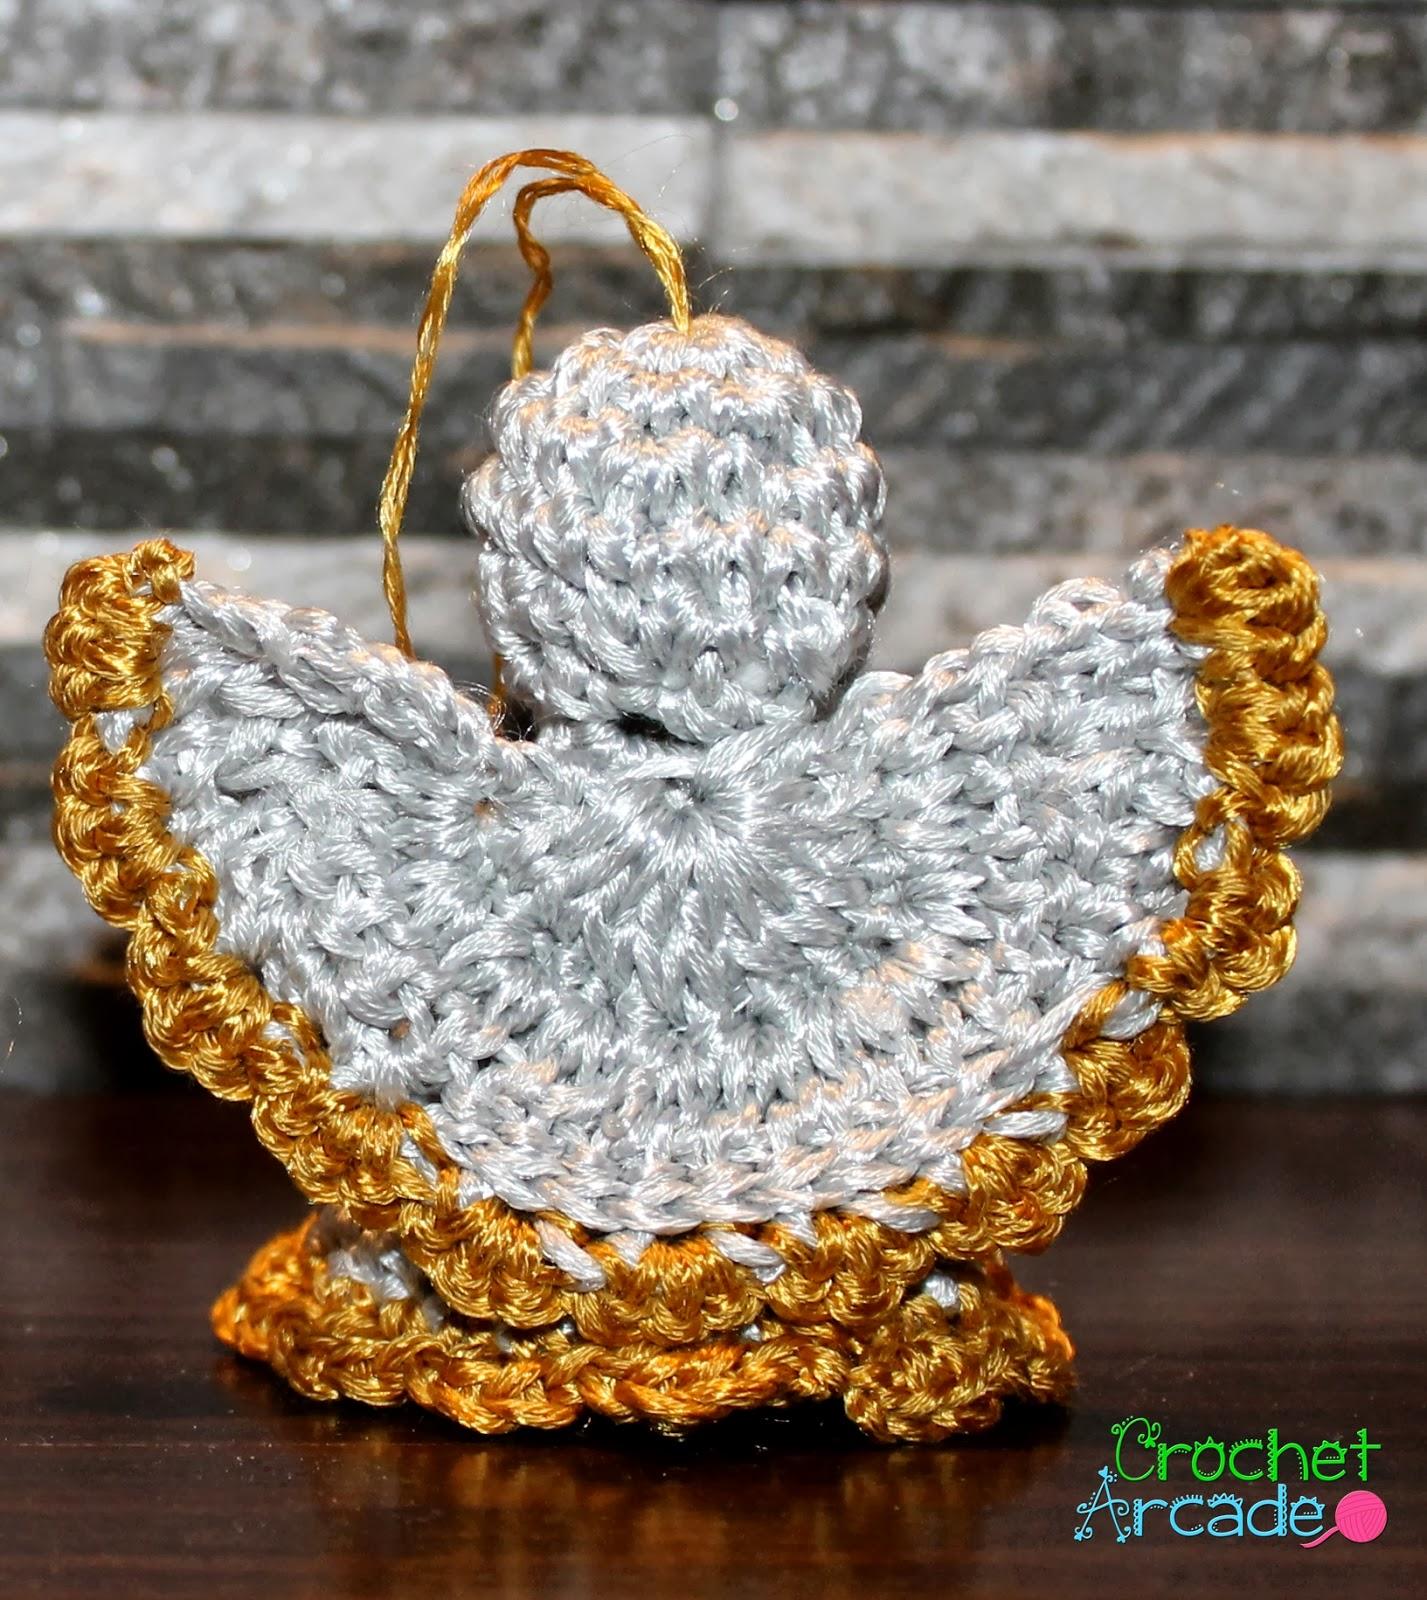 Crochet Angel Christmas Ornament Free Pattern – Crochet Arcade